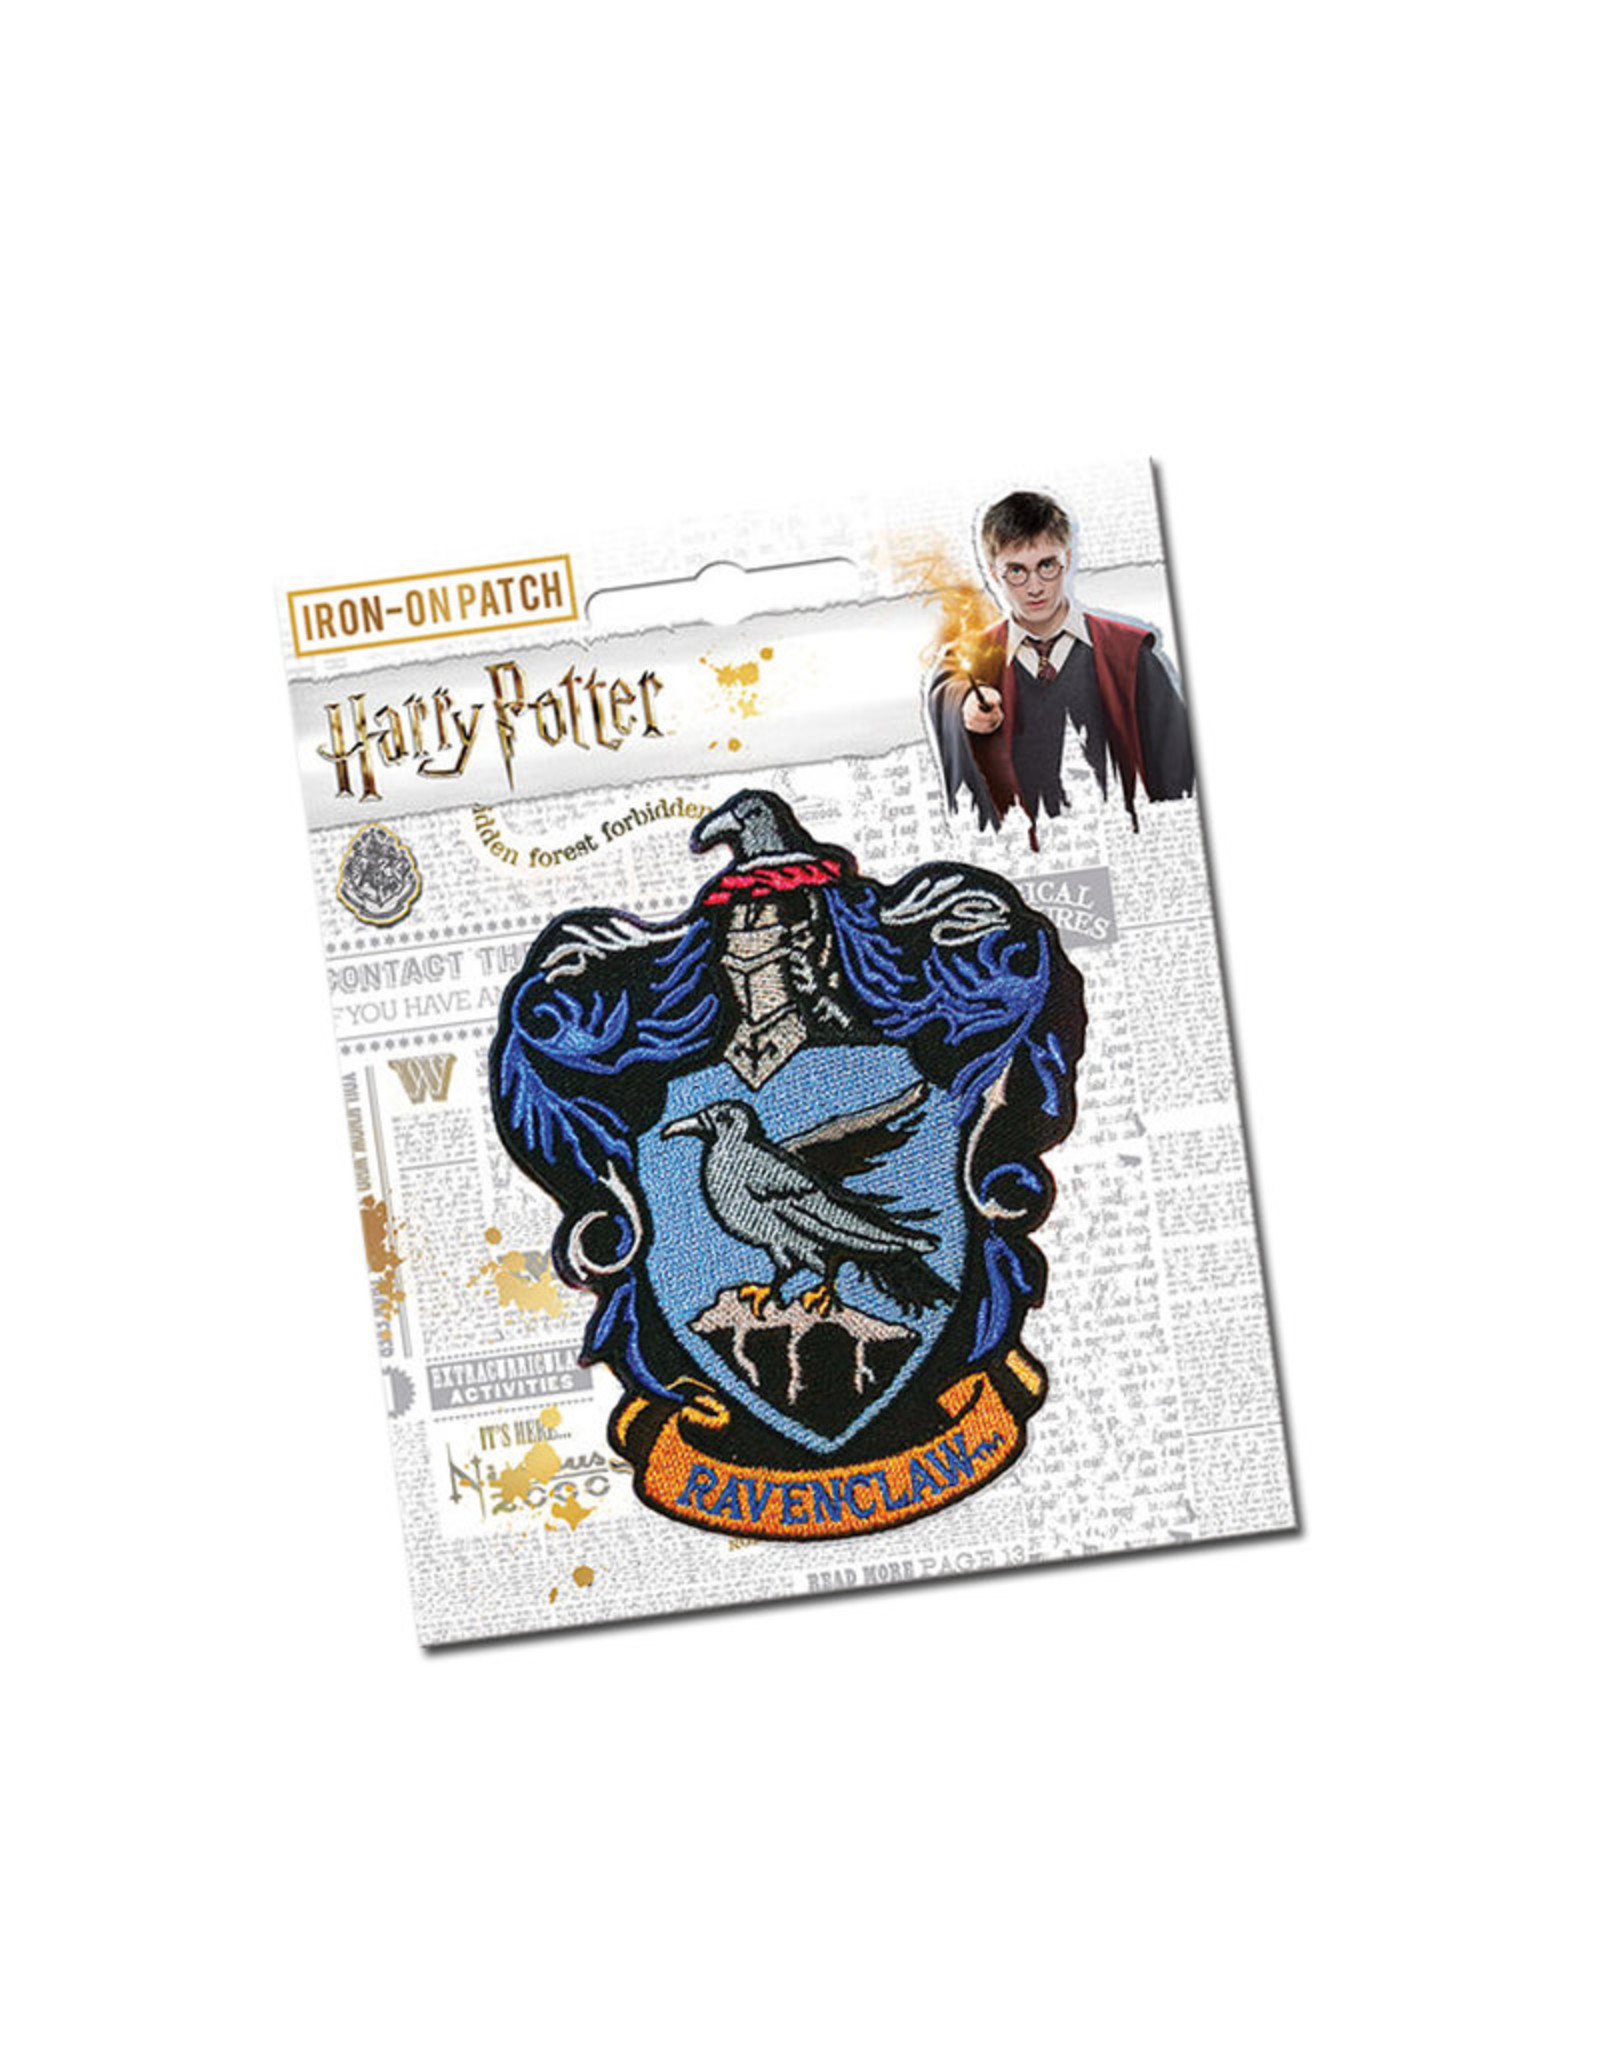 Harry Potter Harry Potter ( Iron Patch )  Ravenclaw